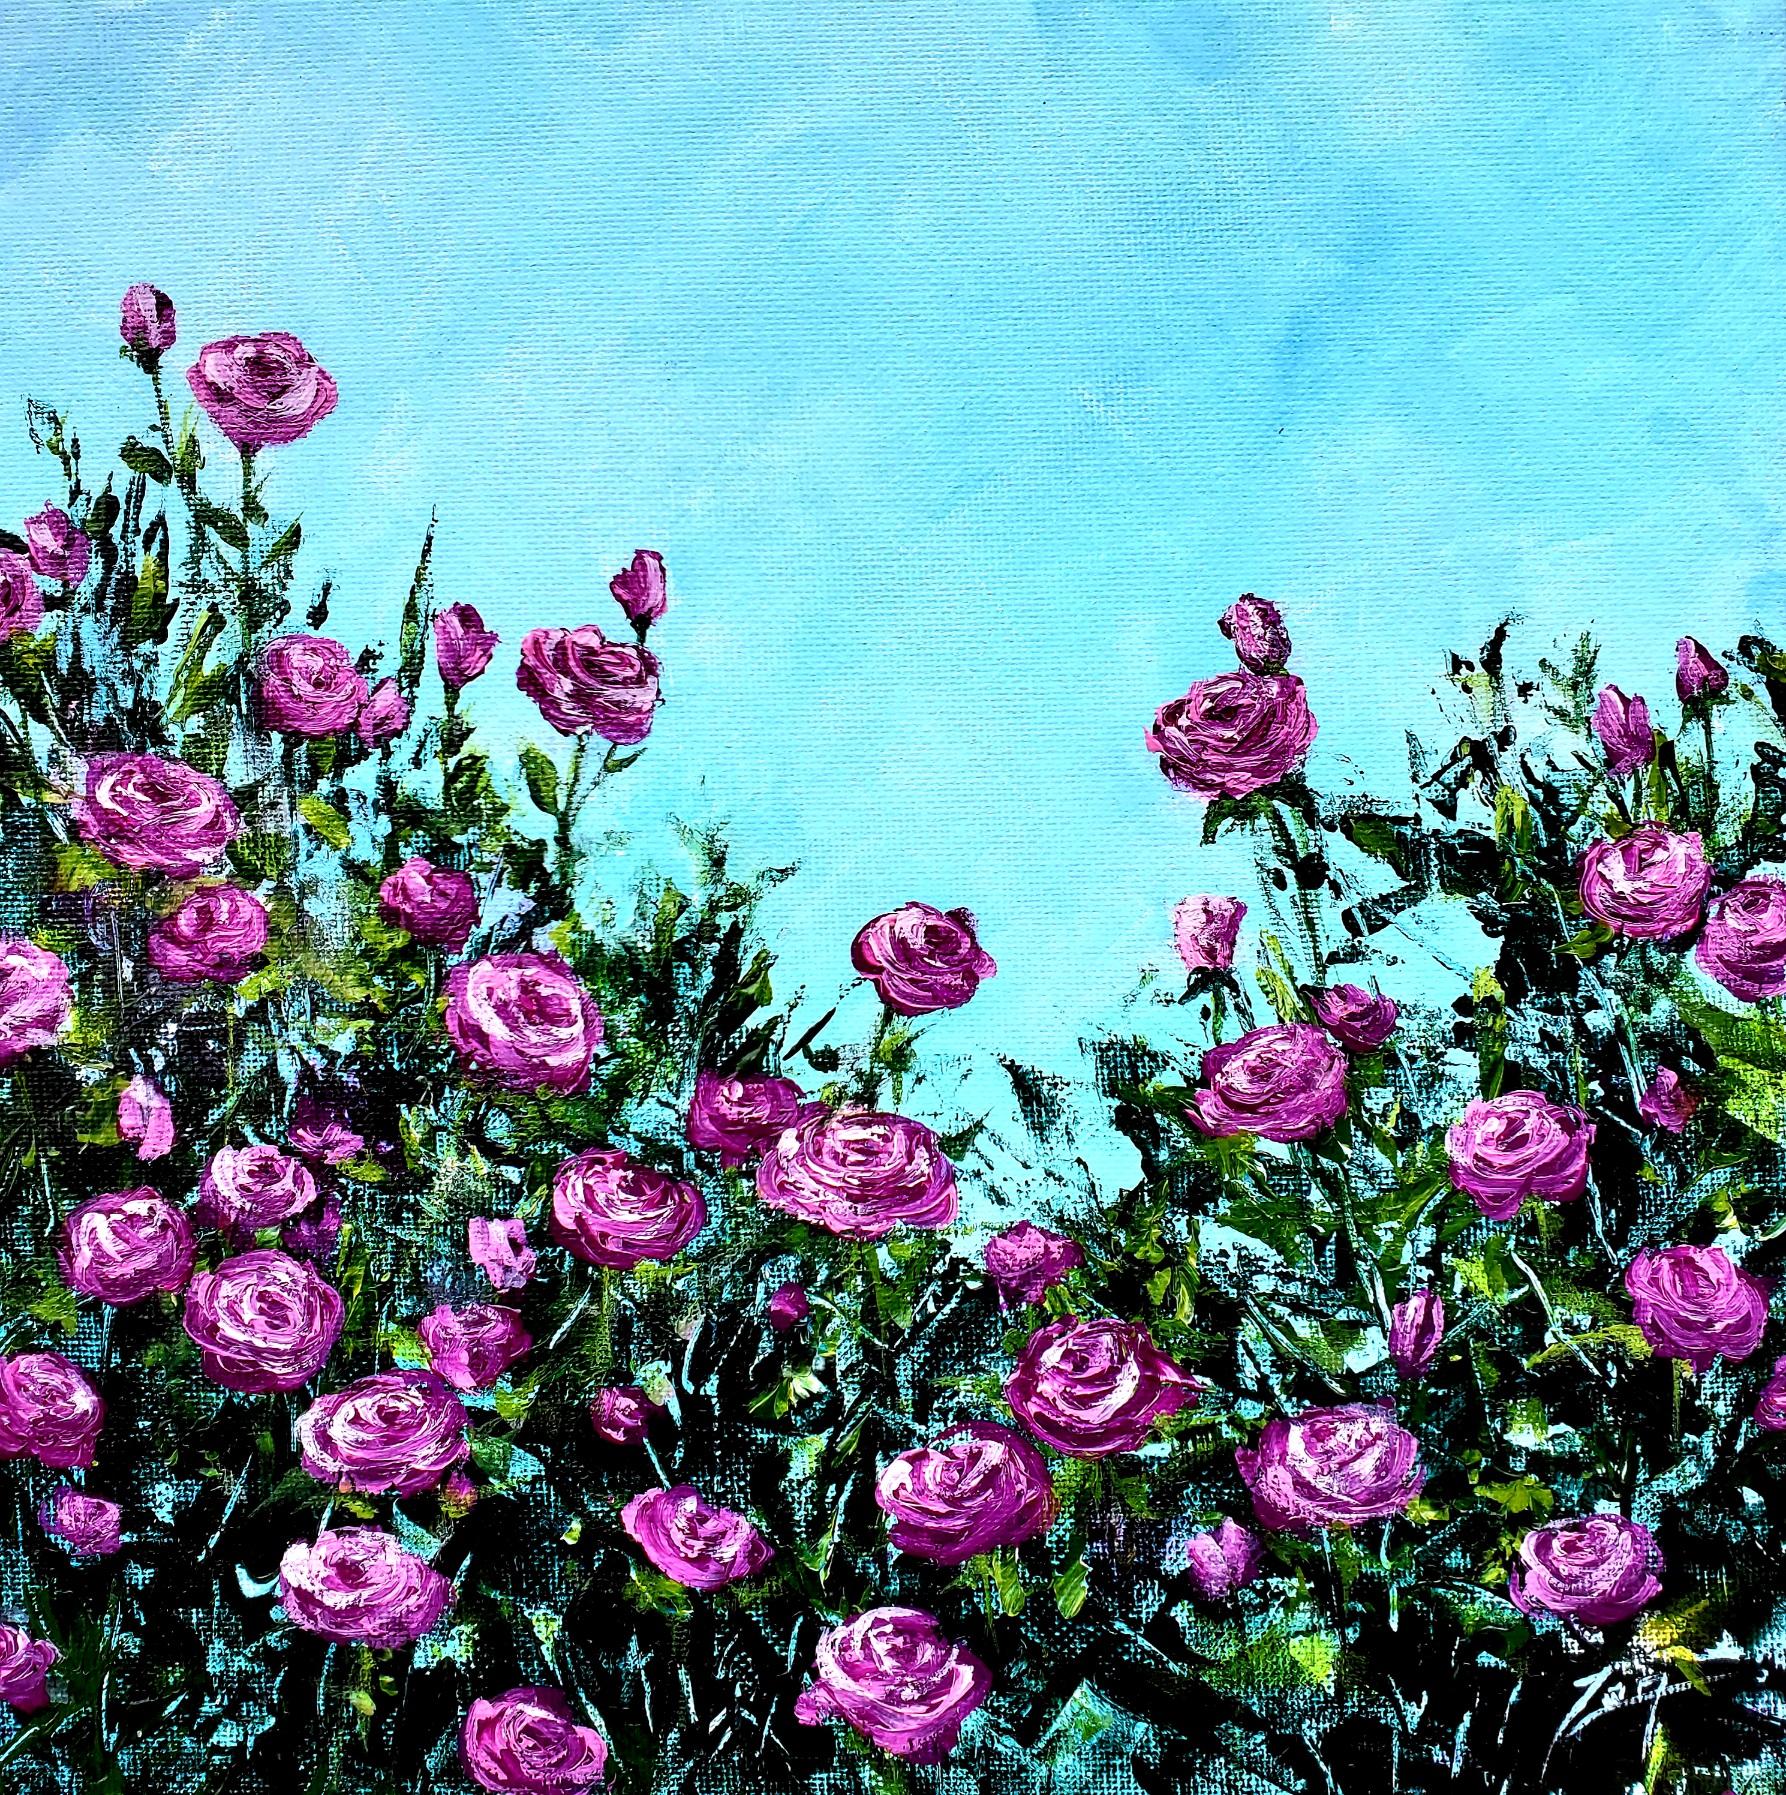 Abstract Roses wv 10x10 ©Zan Savage